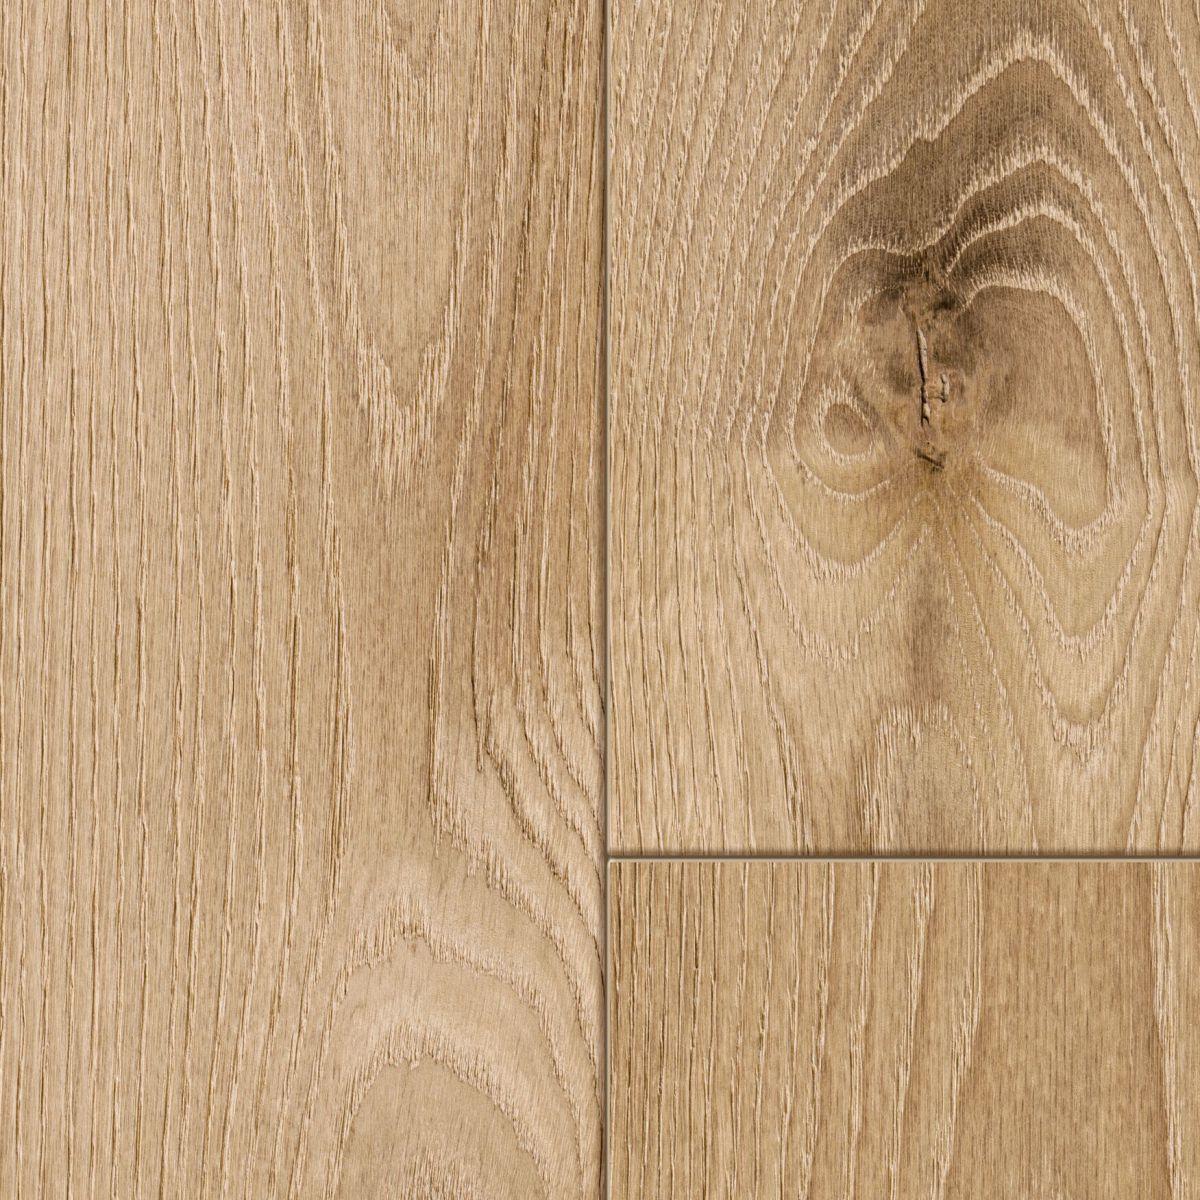 Avatara vloerdelen hout N01 detail